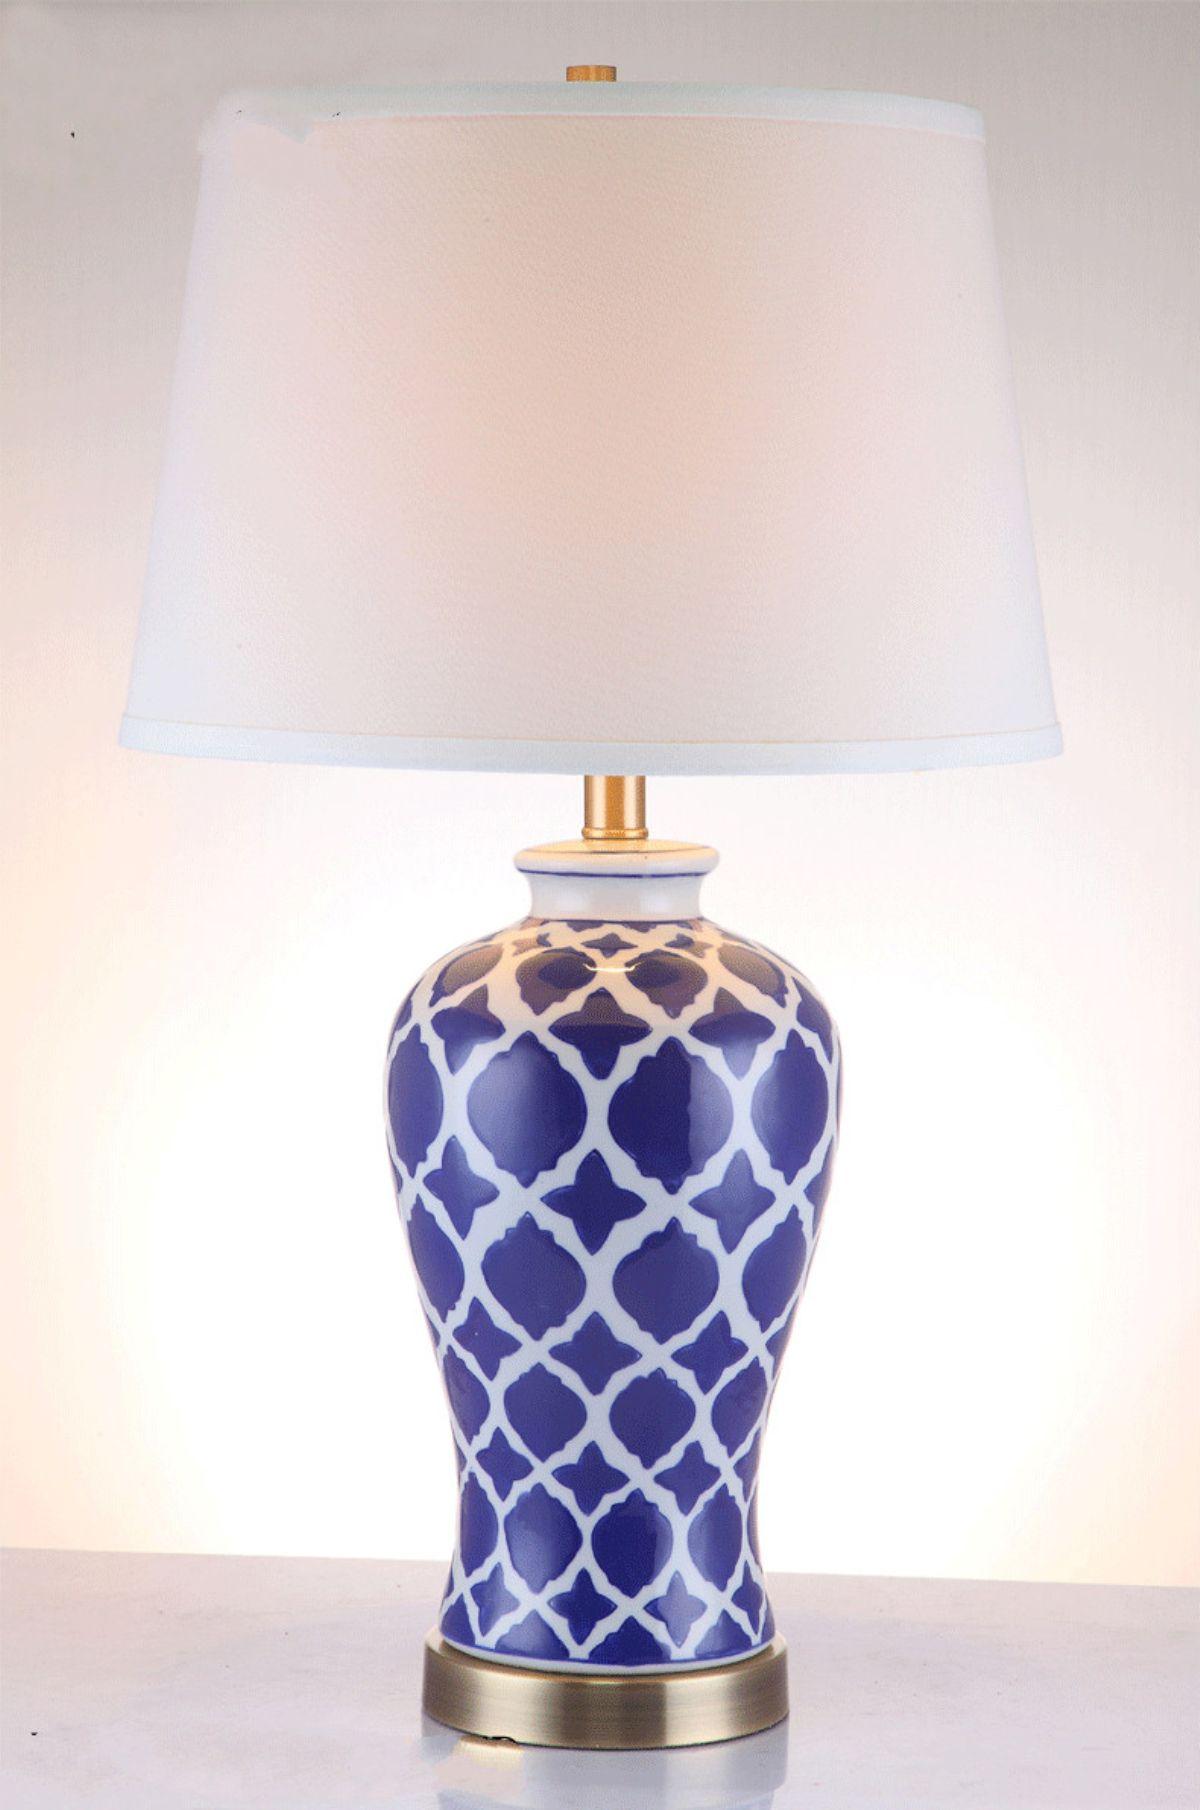 Modern ceramic table lamps - Modern Ceramic Table Lamp Bedside Porcelain Lamp Living Room Bedroom Home Lighting 27 High Ceramic Table Lamp Table Lamps Desk Lamp Led Light Online With